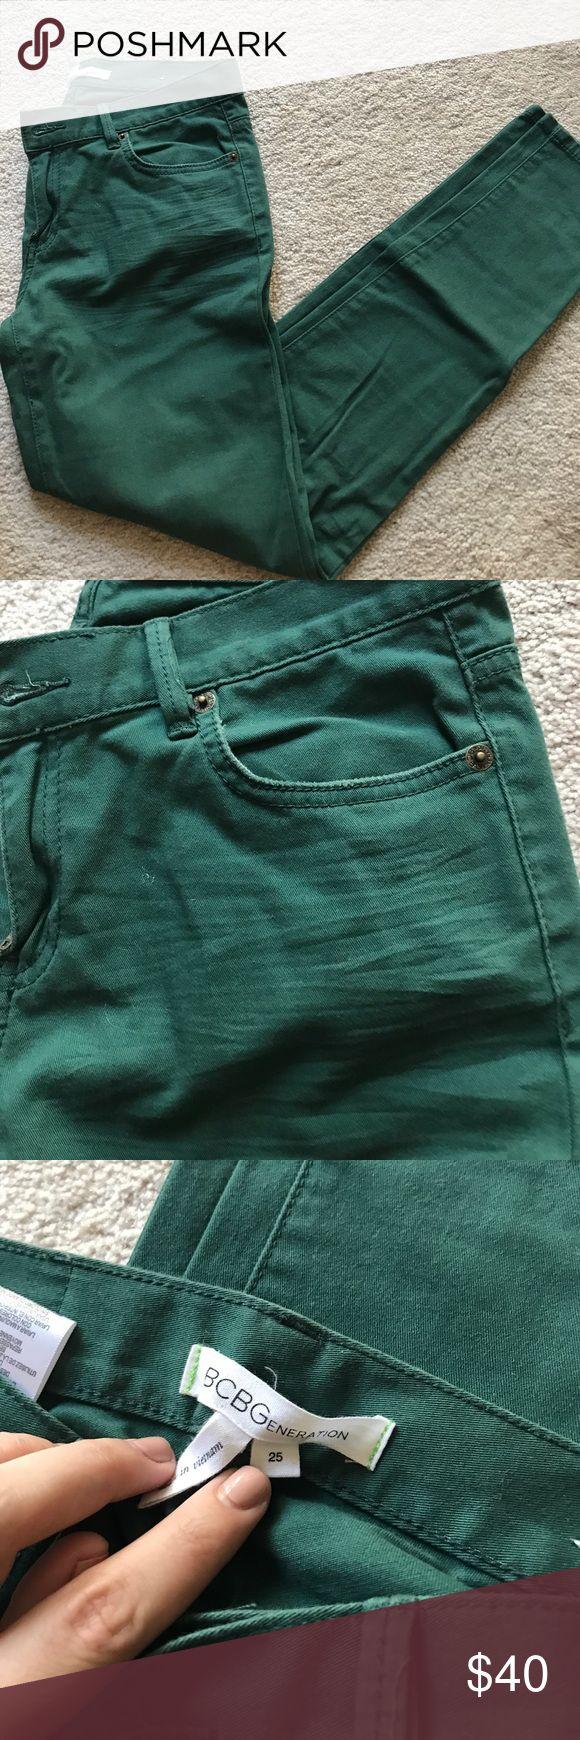 BCBGENERATION hunter green skinny jeans BCBGENERATION hunter green skinny jeans. Great condition! Size 25. BCBGeneration Pants Skinny